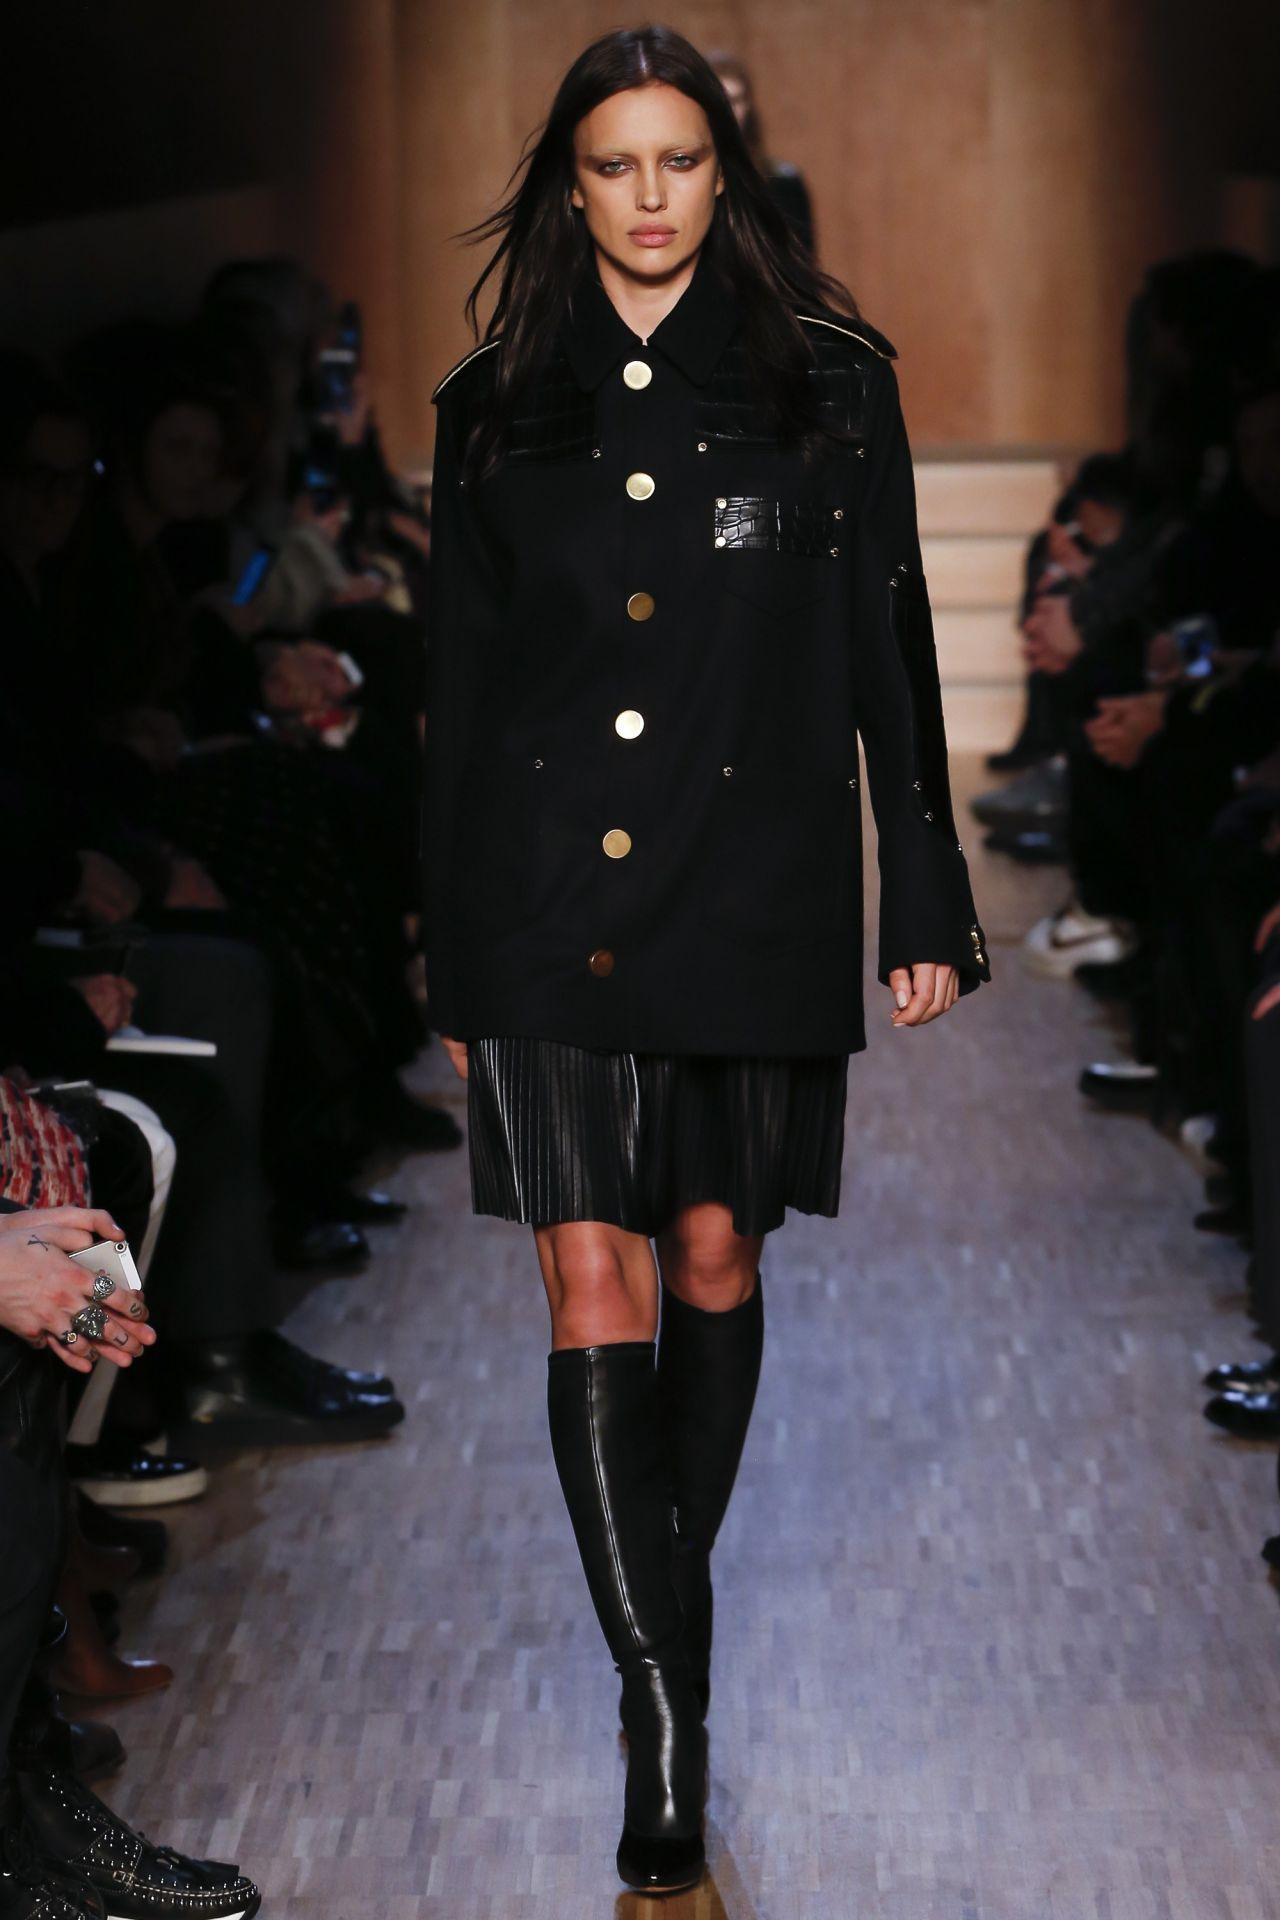 Irina Shayk Givenchy Fashion Show In Paris March 2016